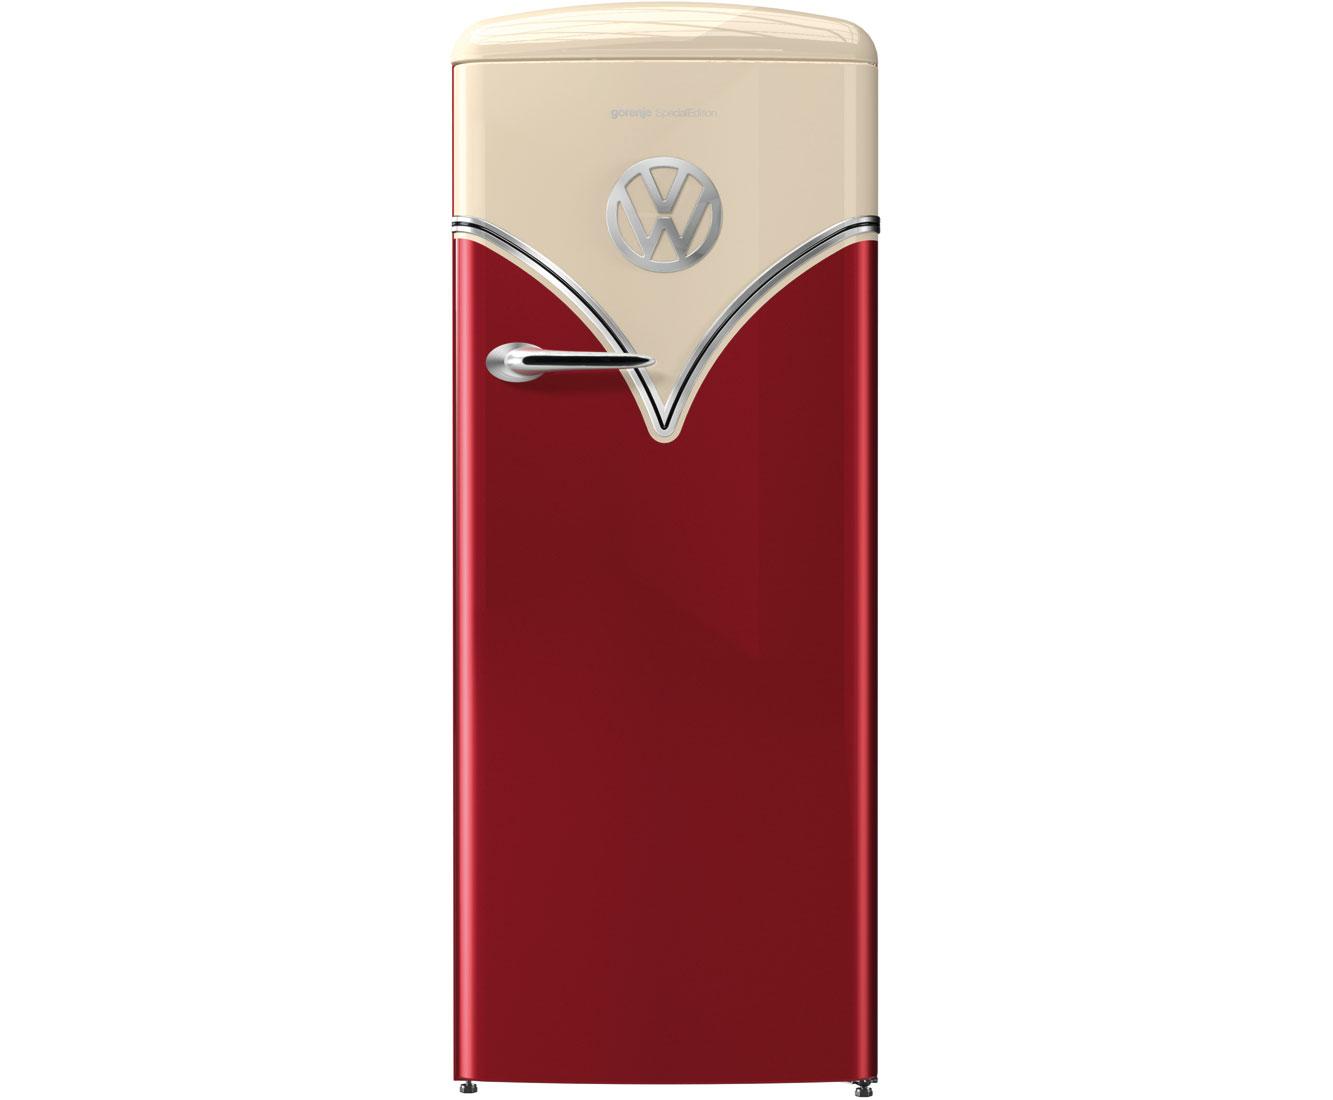 Gorenje Kühlschrank Vw Kaufen : Gorenje retro kühlschrank gefrierschrank gebraucht kaufen